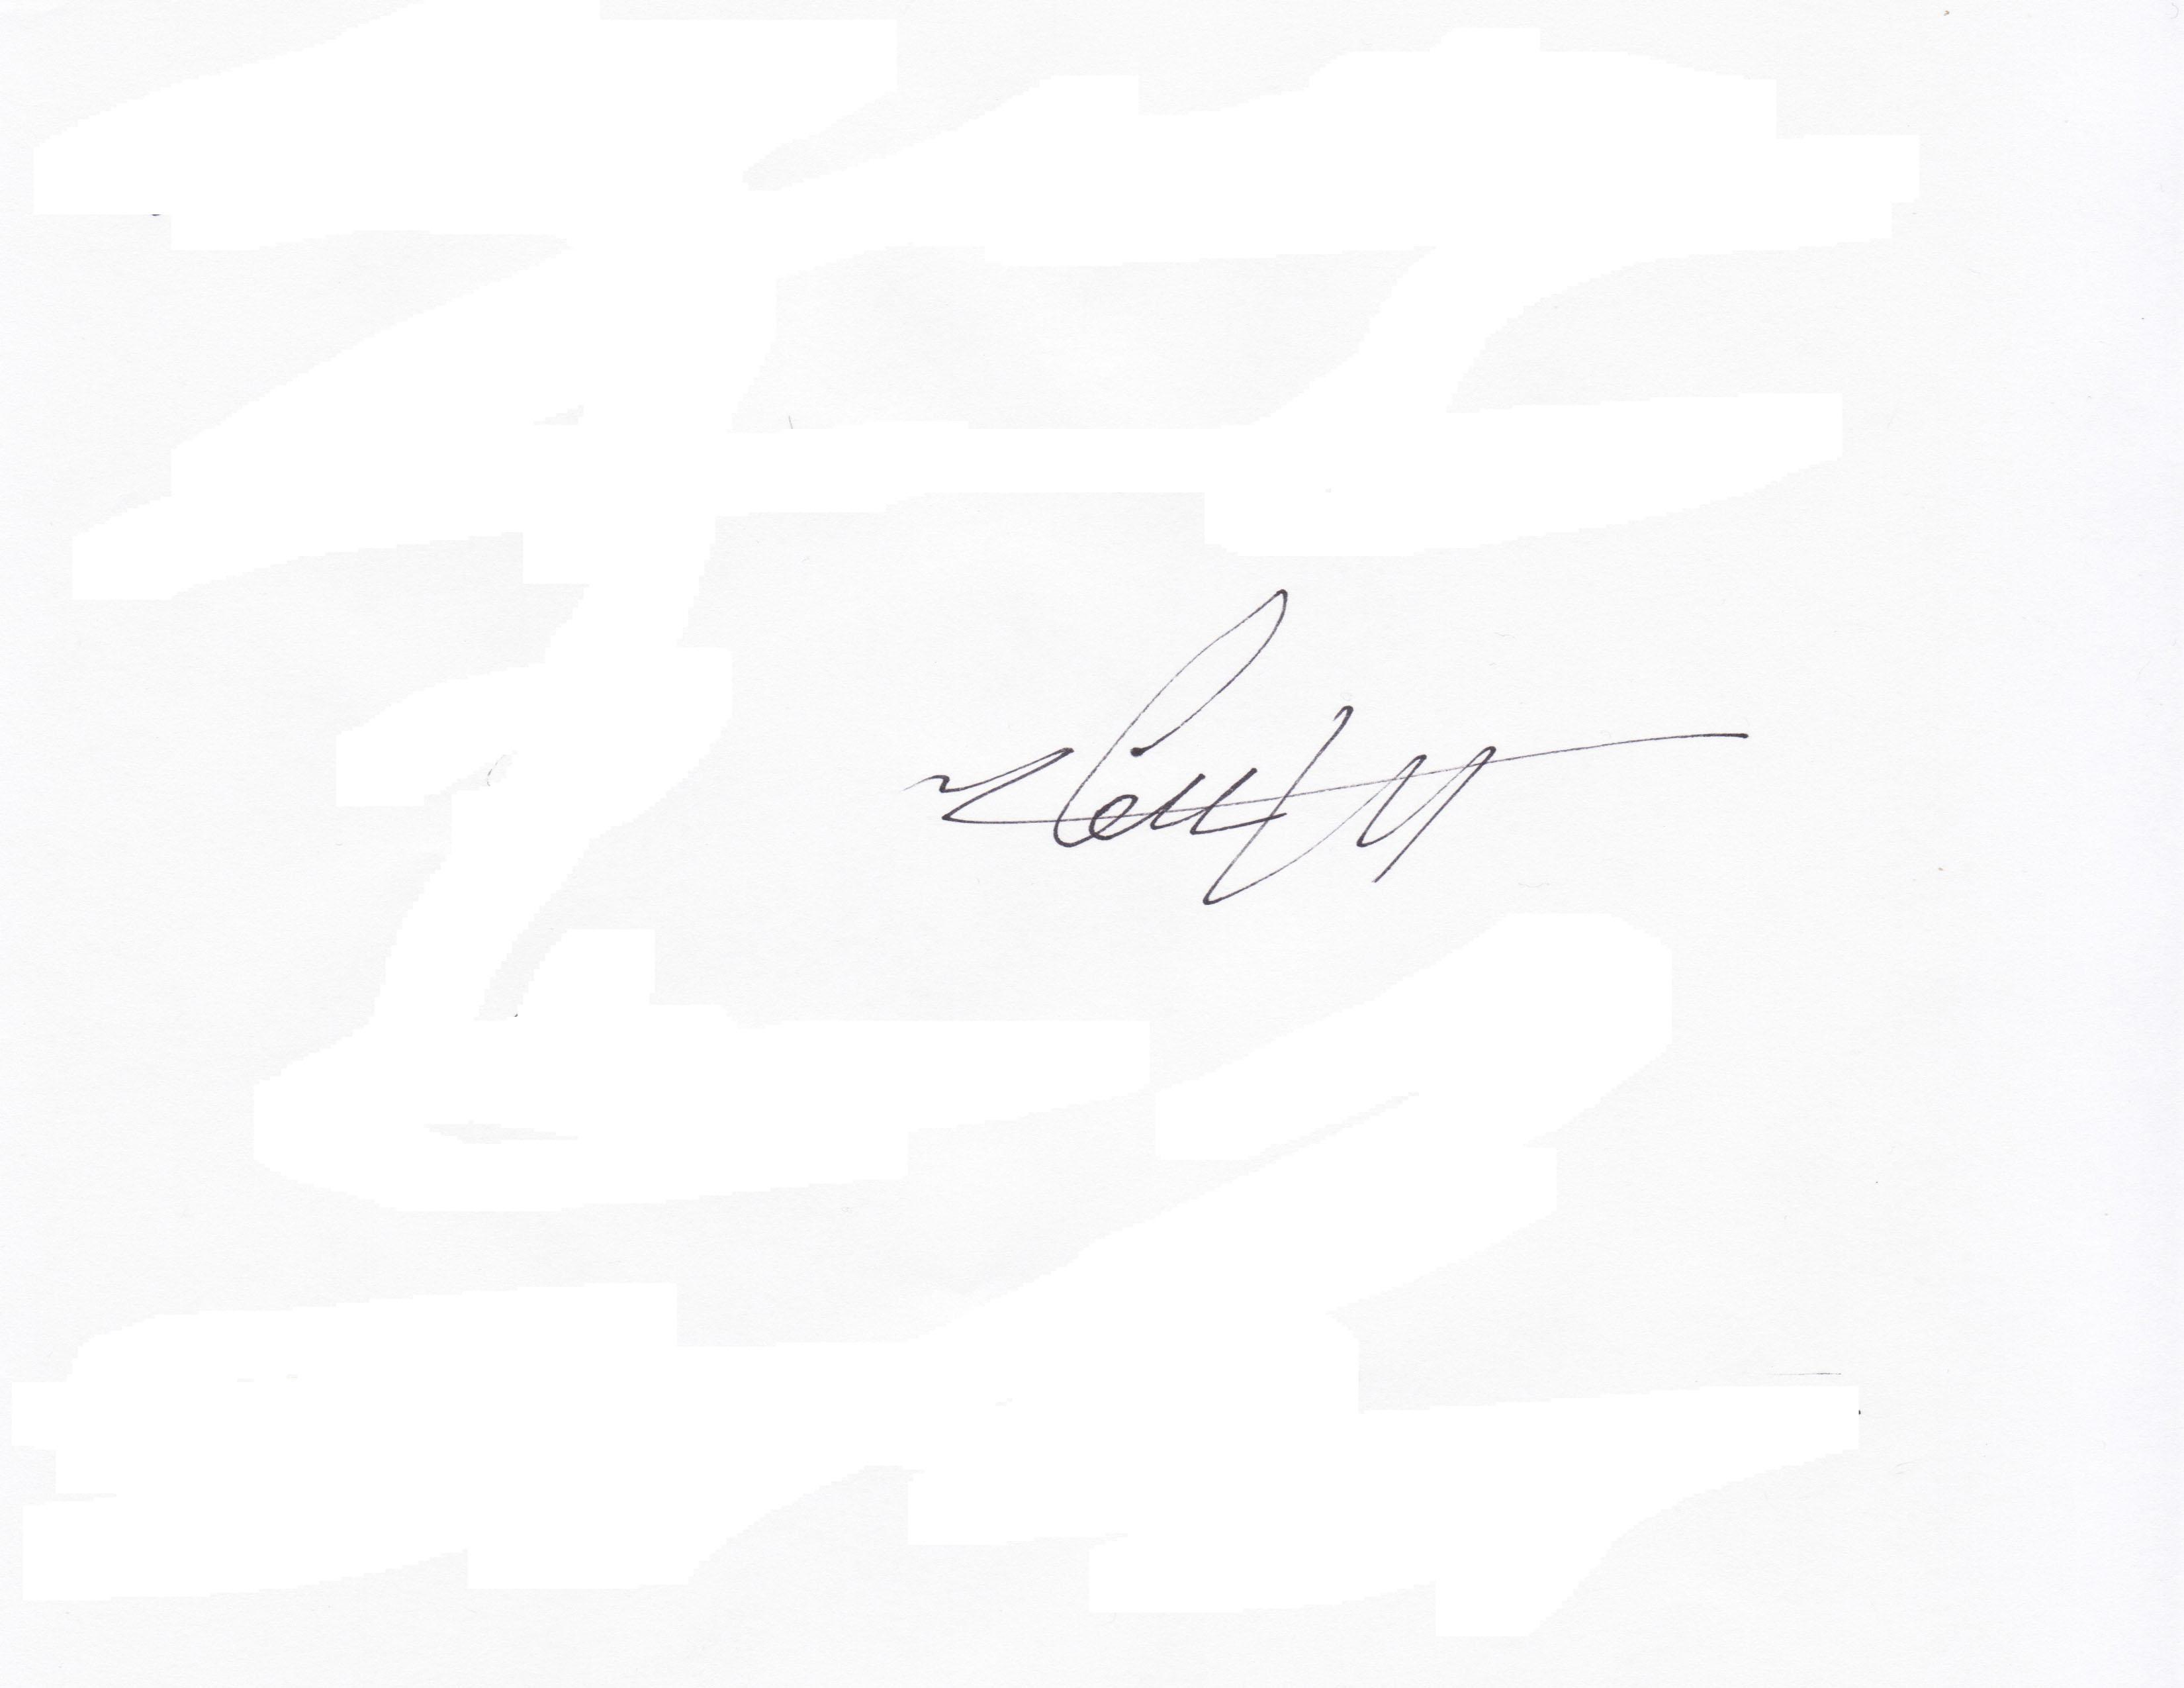 Ming Wong's Signature